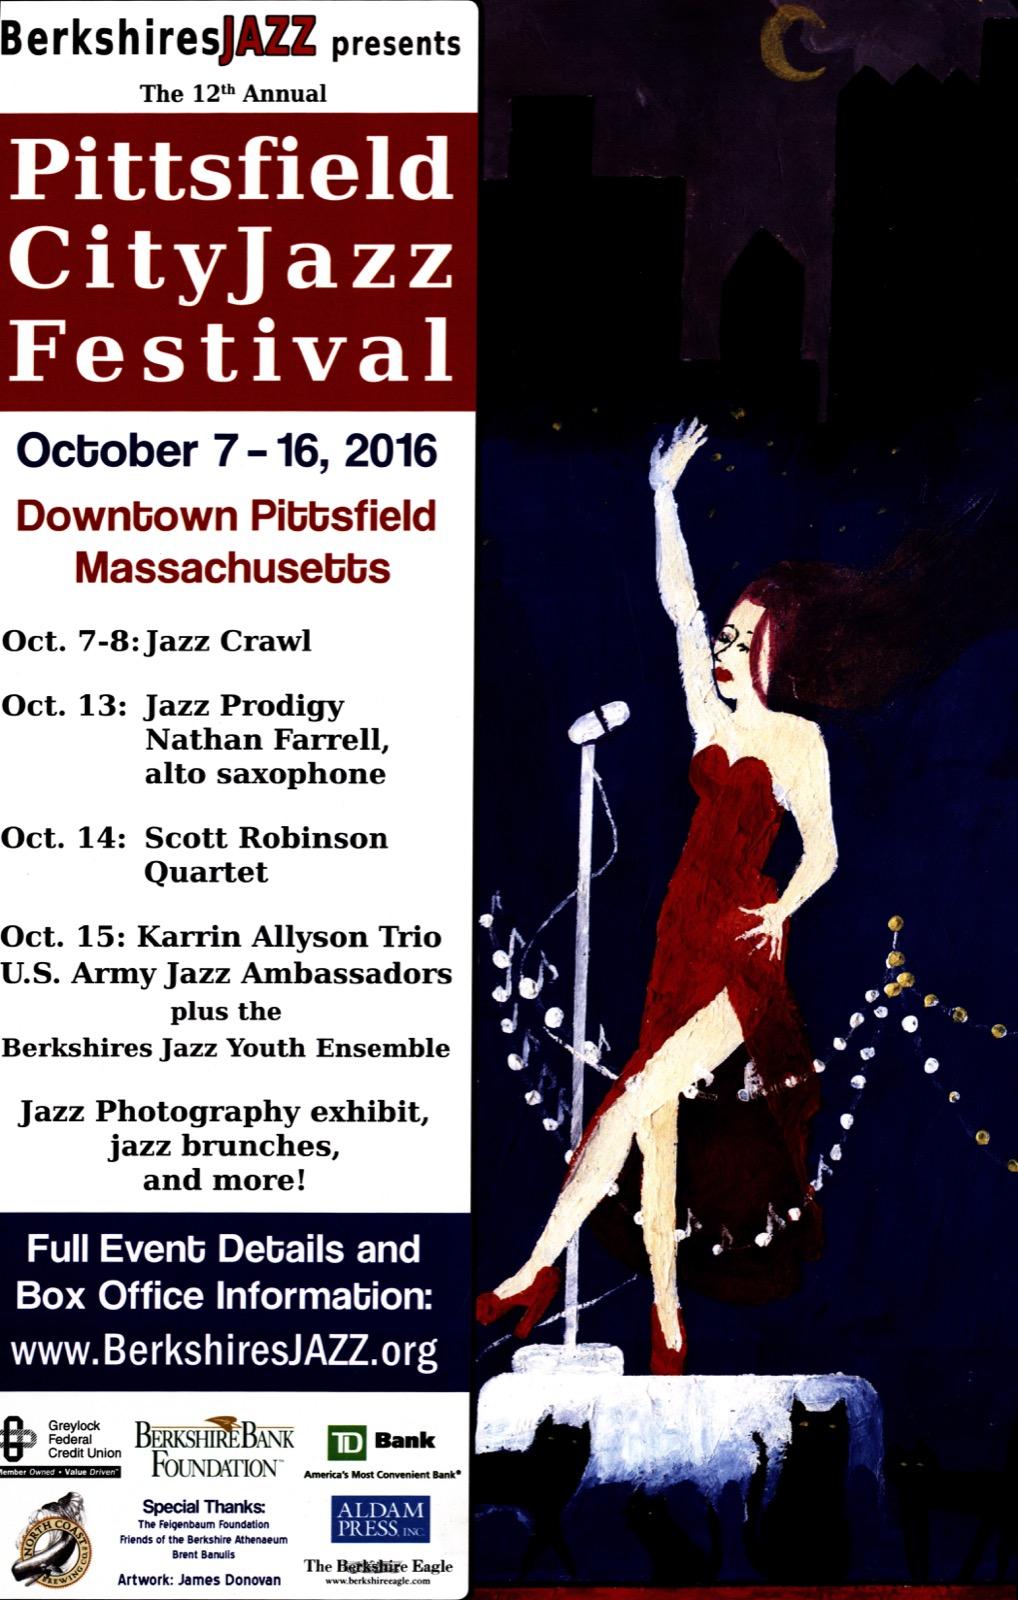 Pittsfield_City_Jazz_Fest_Oct7-16.jpg